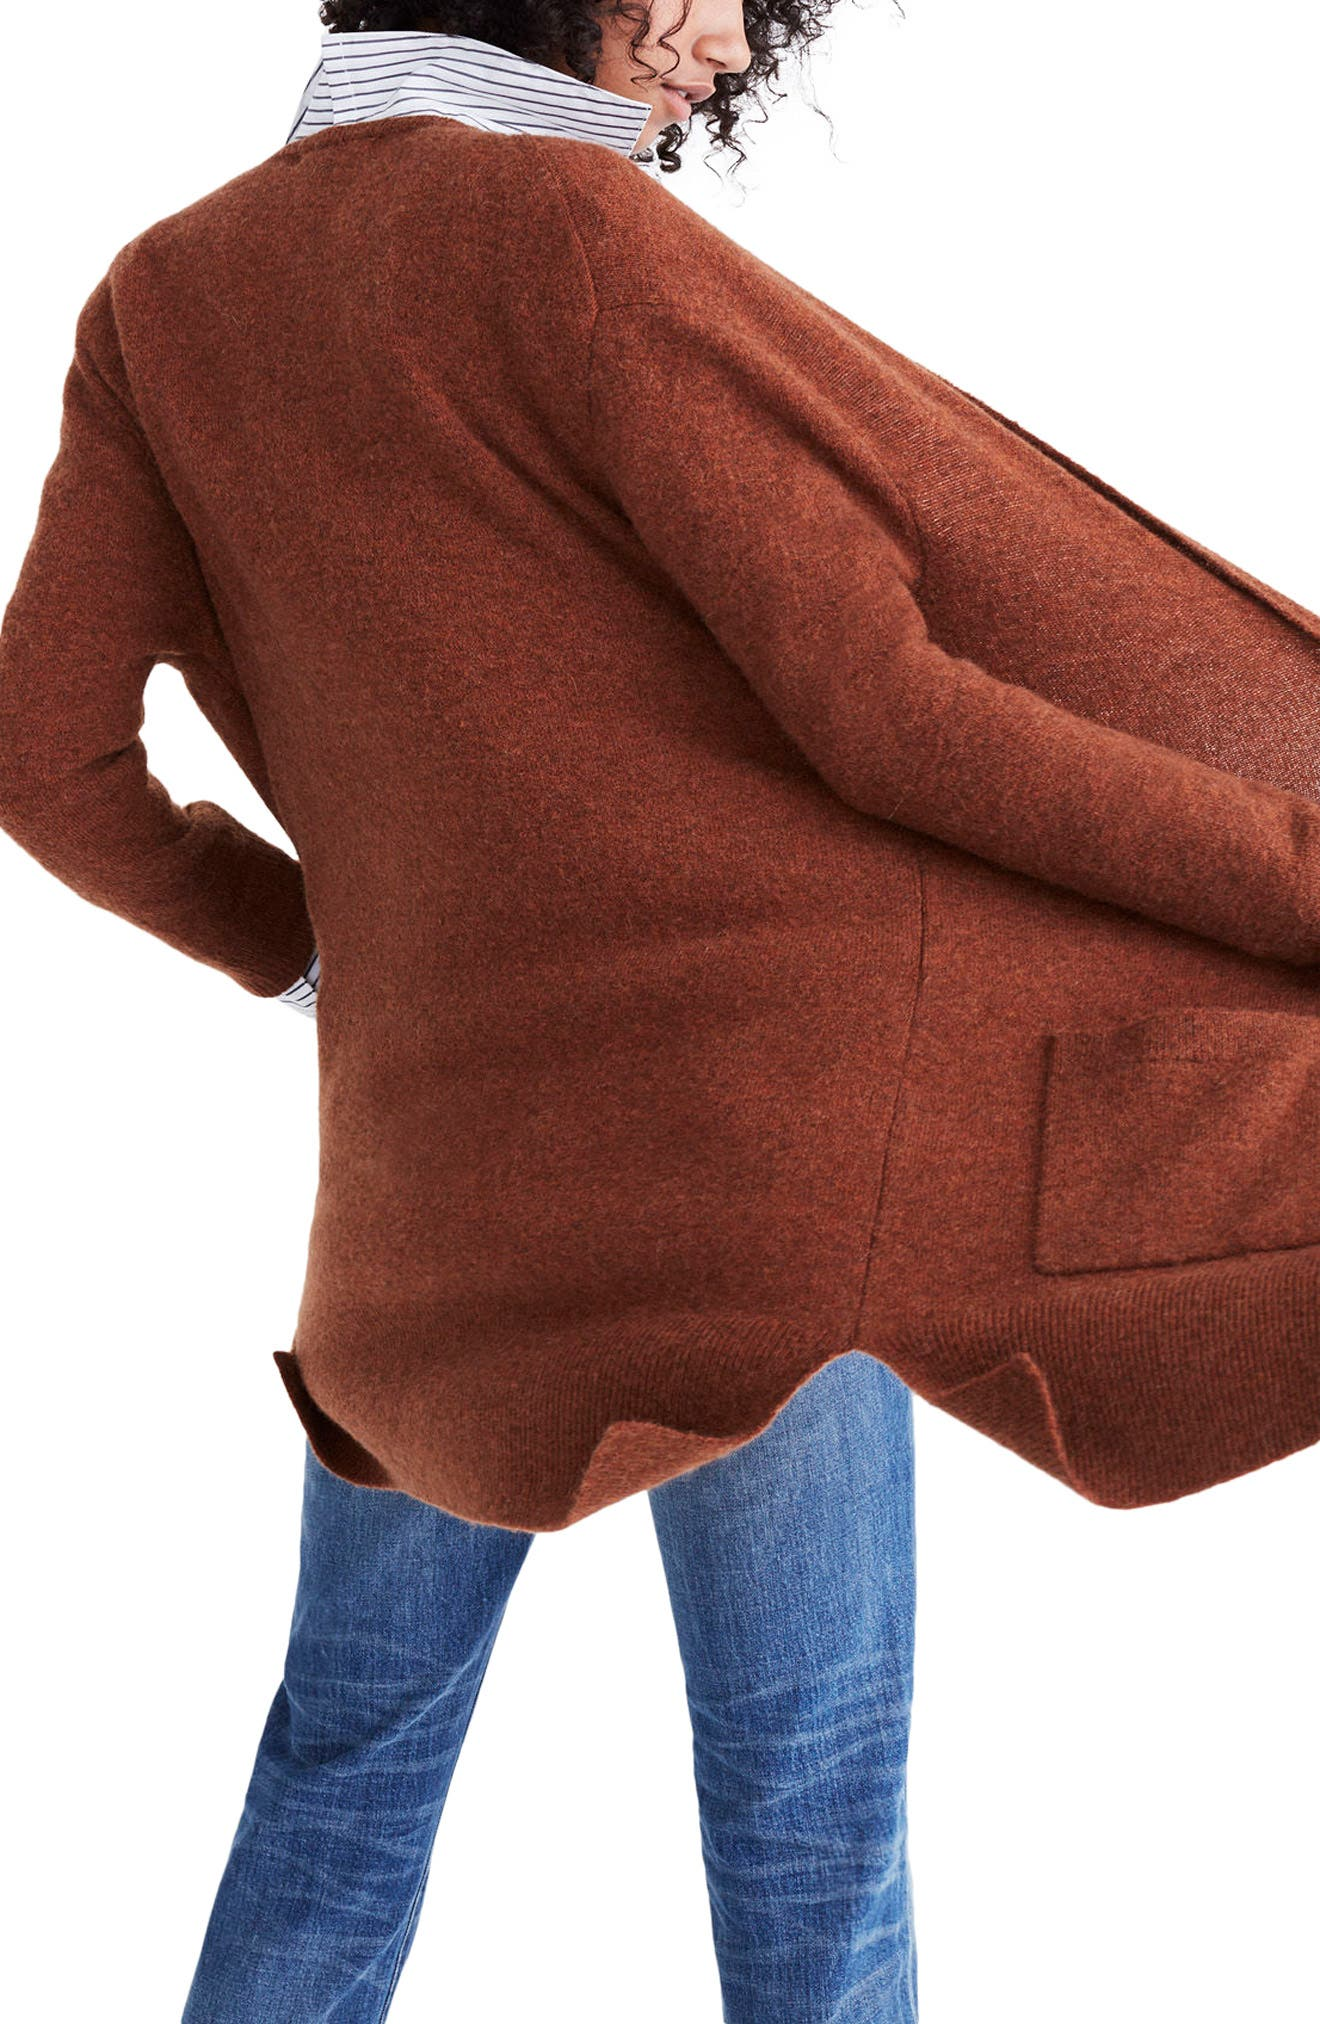 Kent Cardigan Sweater,                             Alternate thumbnail 2, color,                             Heather Clay